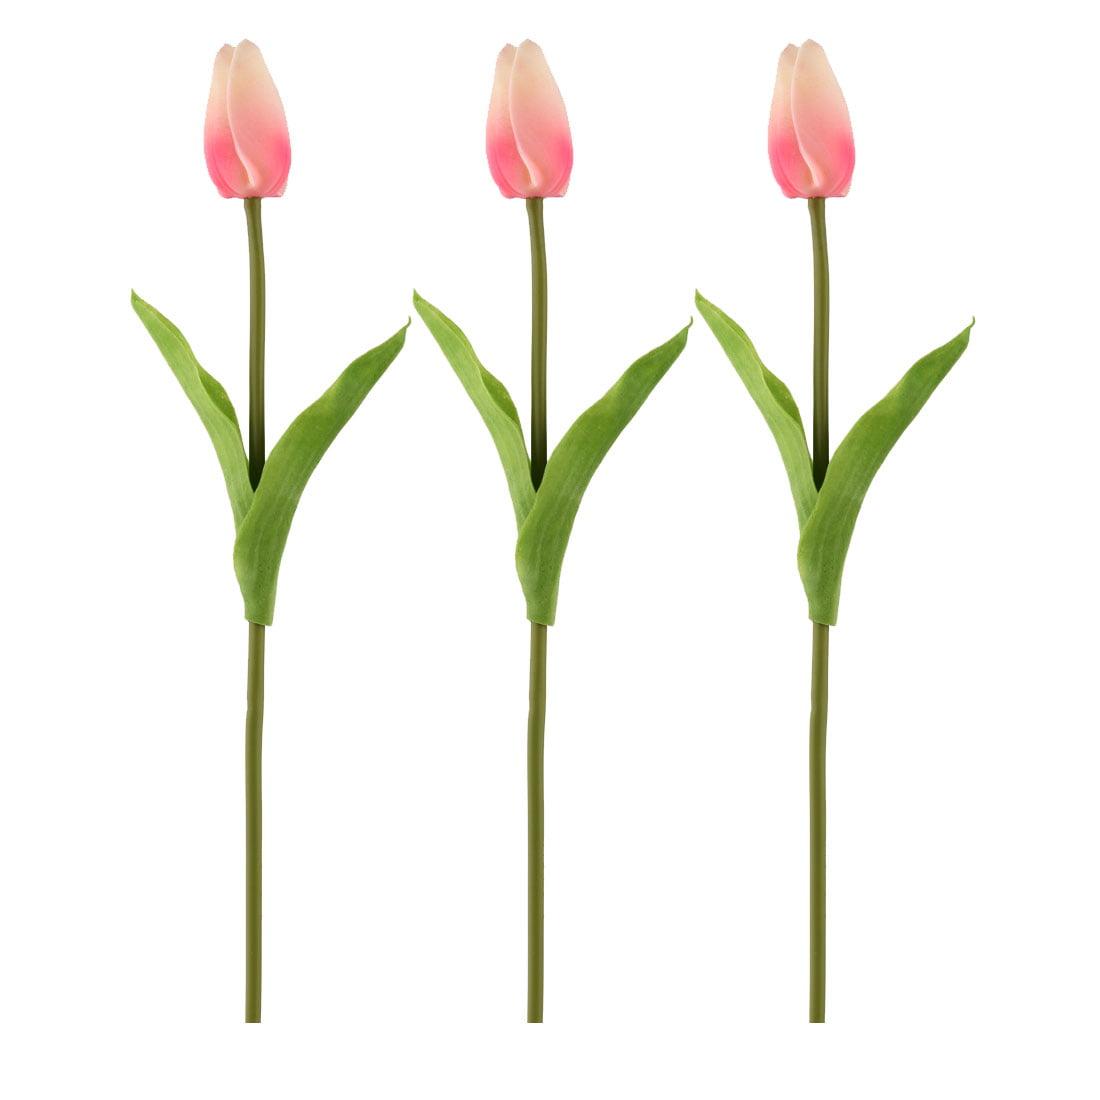 Wedding Banquet Tulip Design Handhold Artificial Flower Bouquet Pink Beige 3pcs